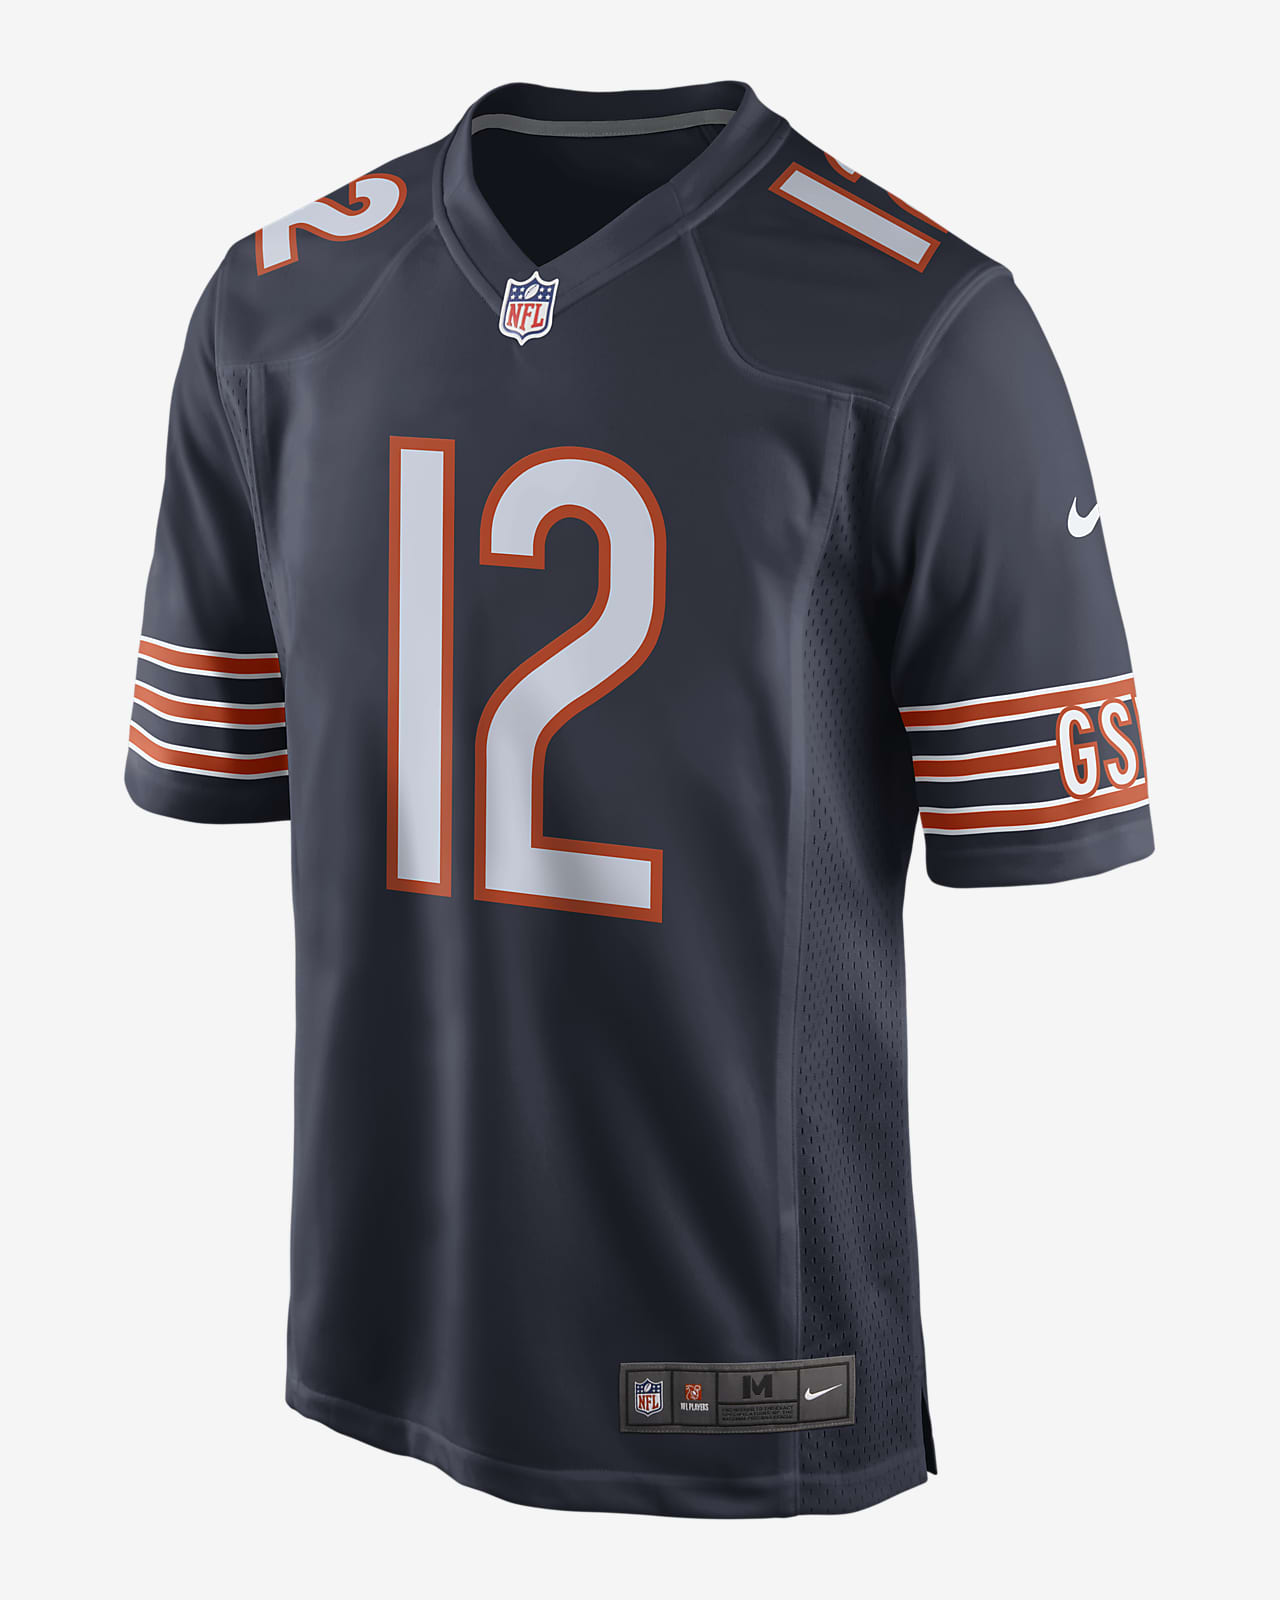 NFL Chicago Bears (Allen Robinson) Men's Game Football Jersey